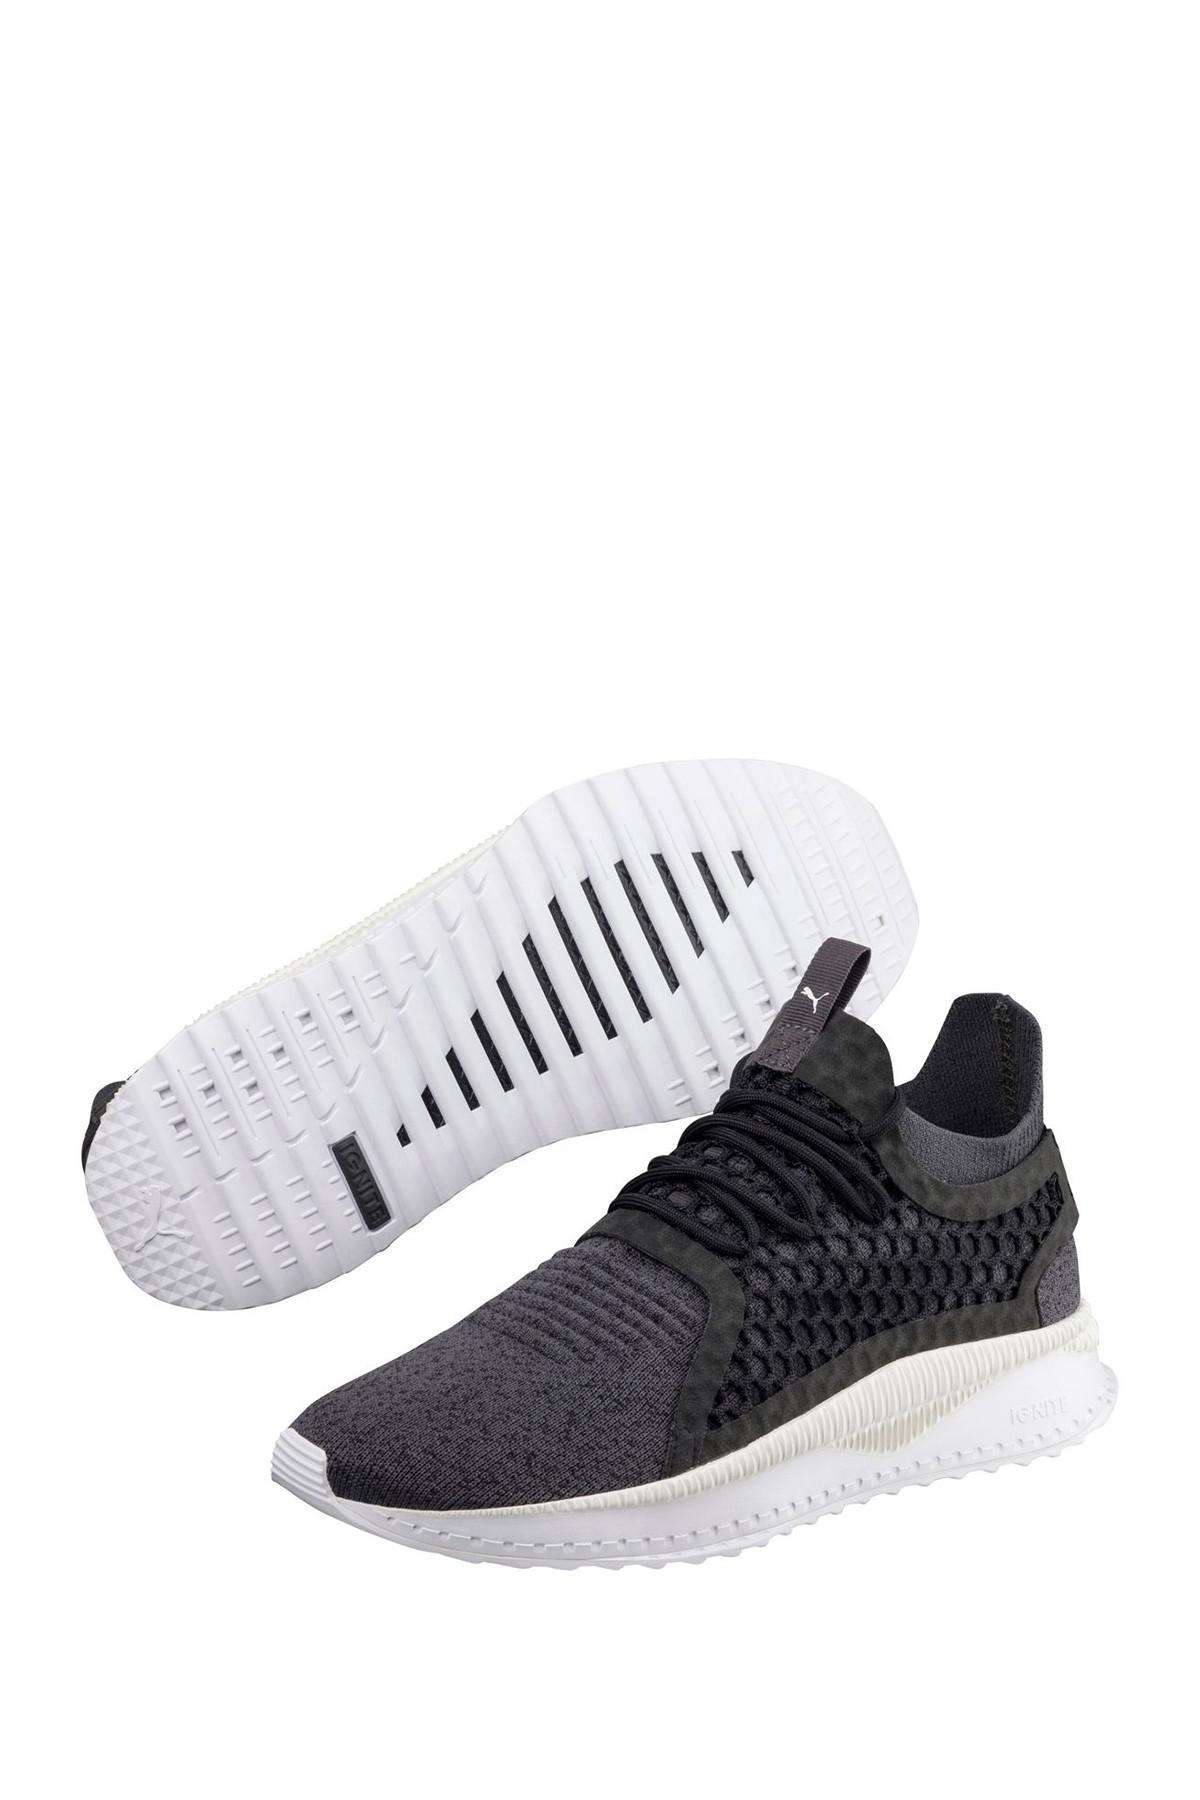 f113497da19b Lyst - PUMA Tsugi Netfit Evoknit V2 Training Sneaker in Black for Men